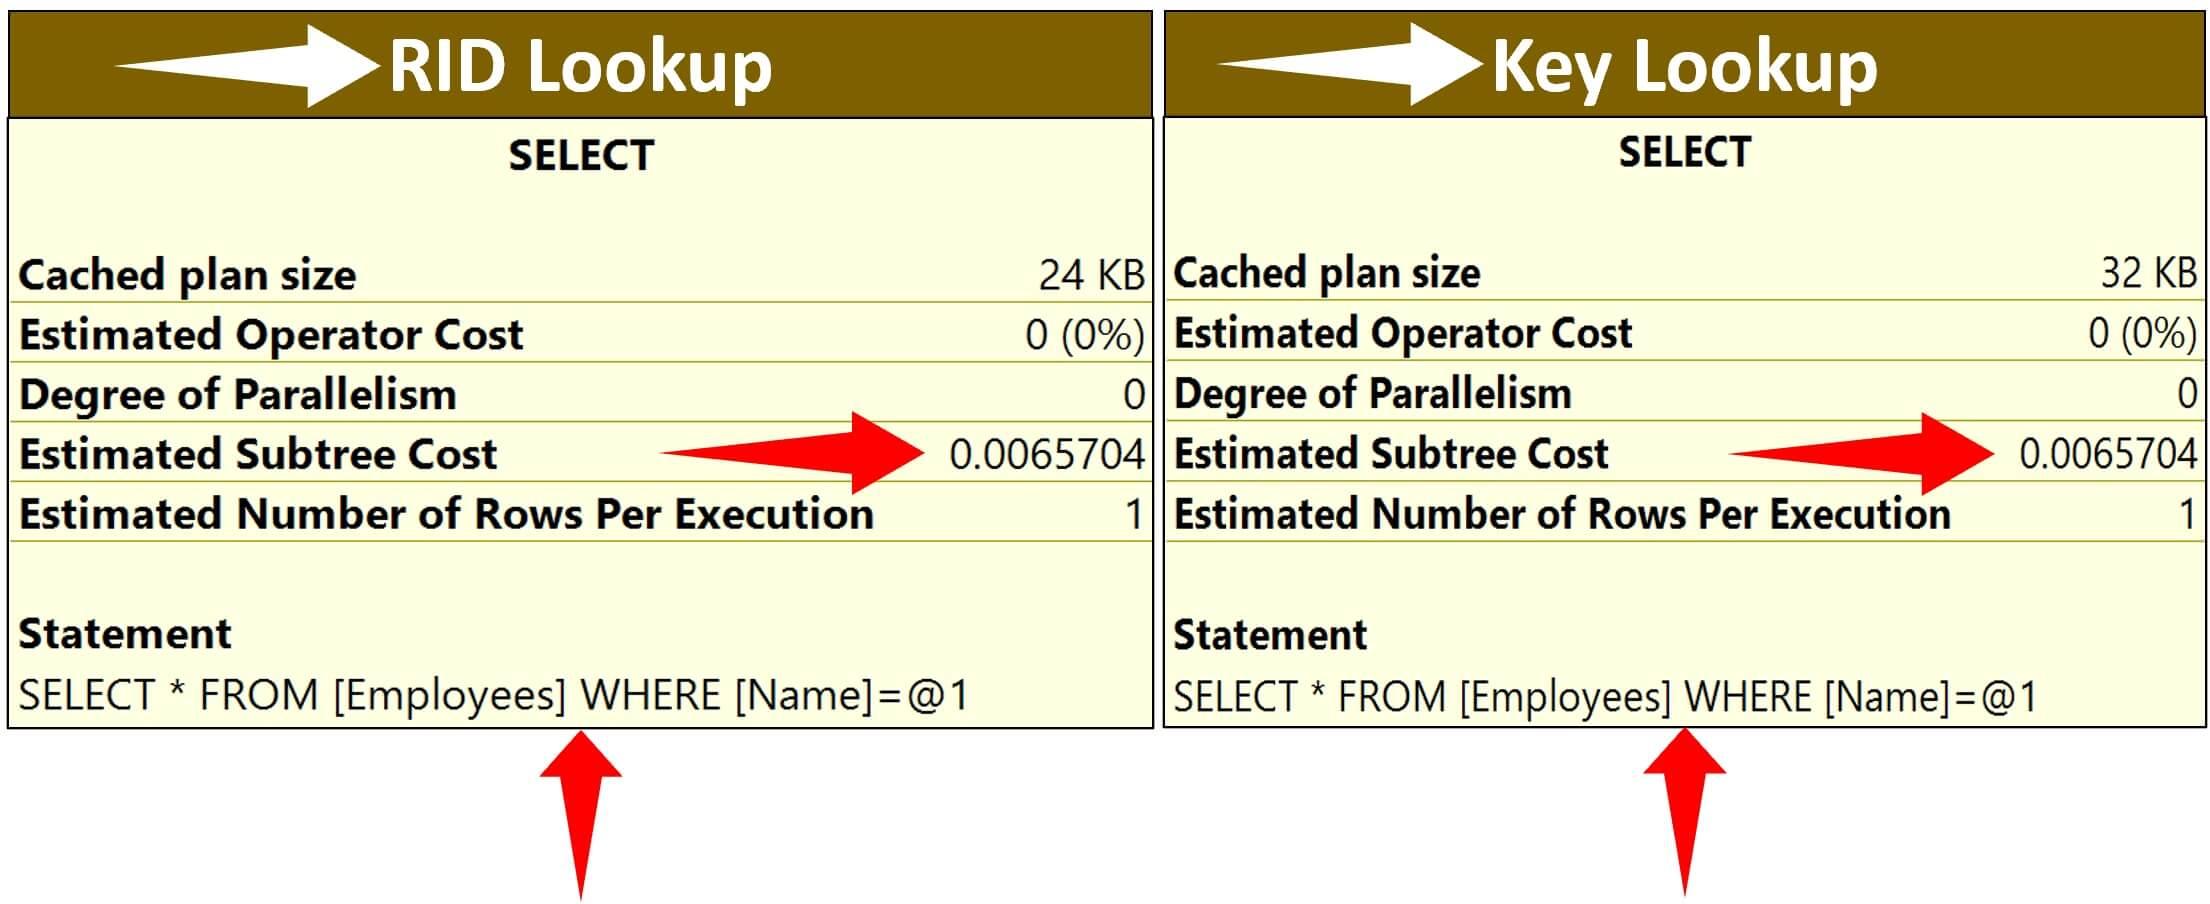 sql server key lookup vs rid lookup